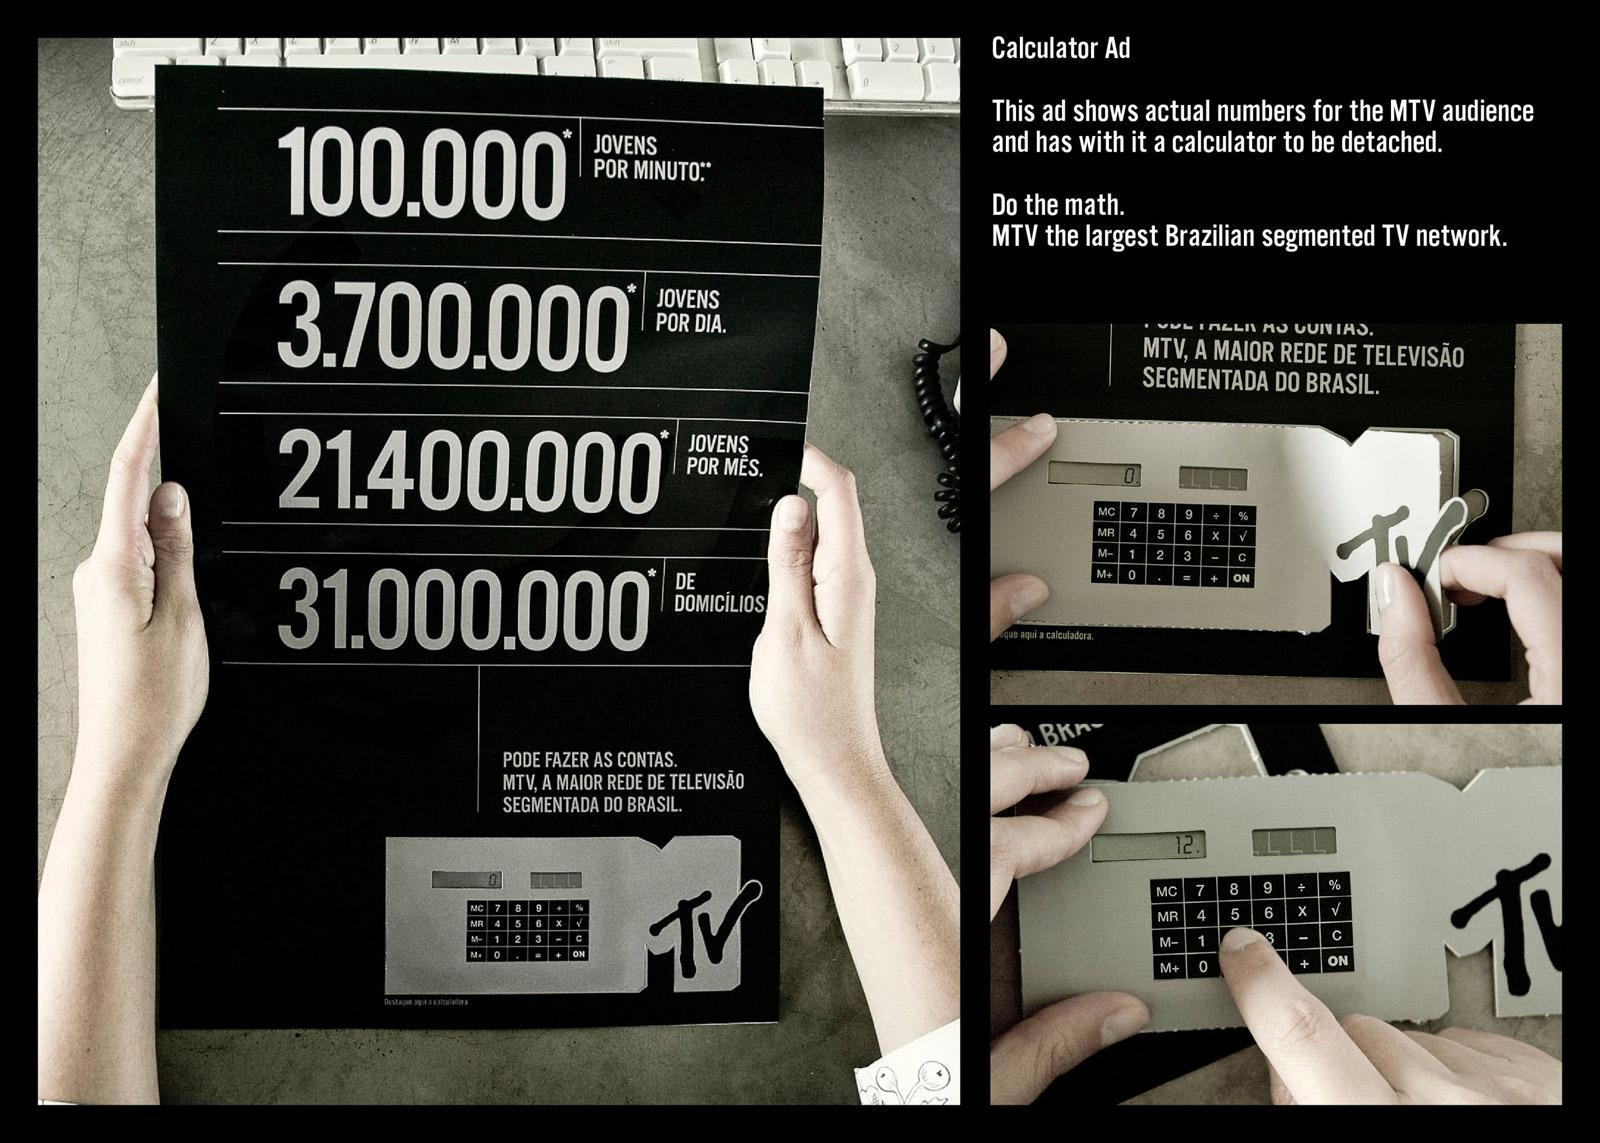 MTV Direct Ad -  Calculator